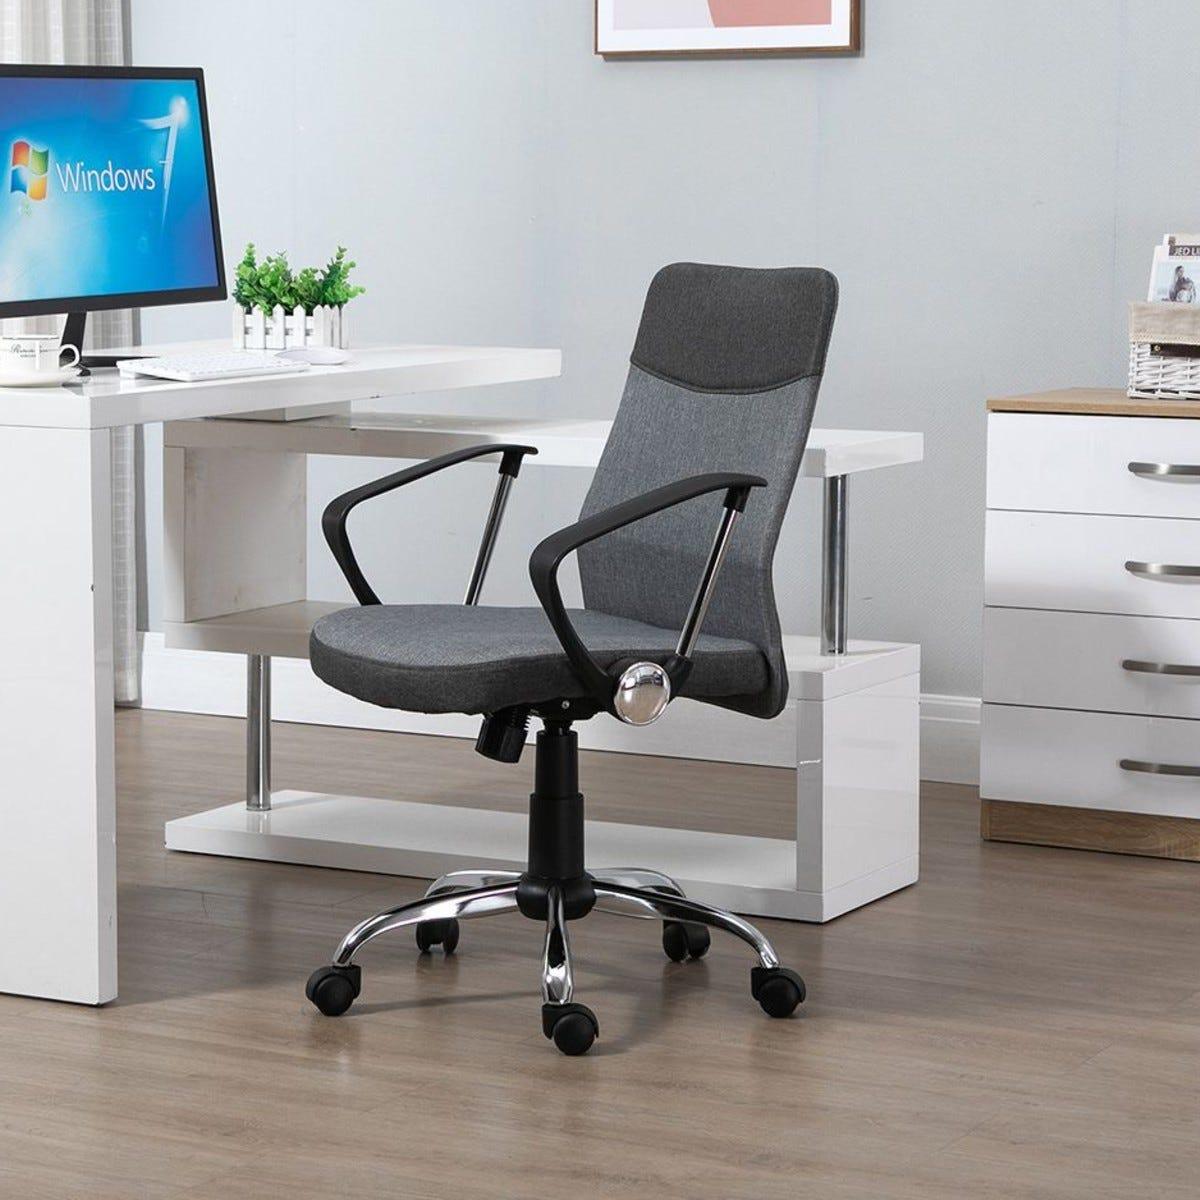 Office Chair Mesh Fabric Swivel Rocker With Wheels Grey